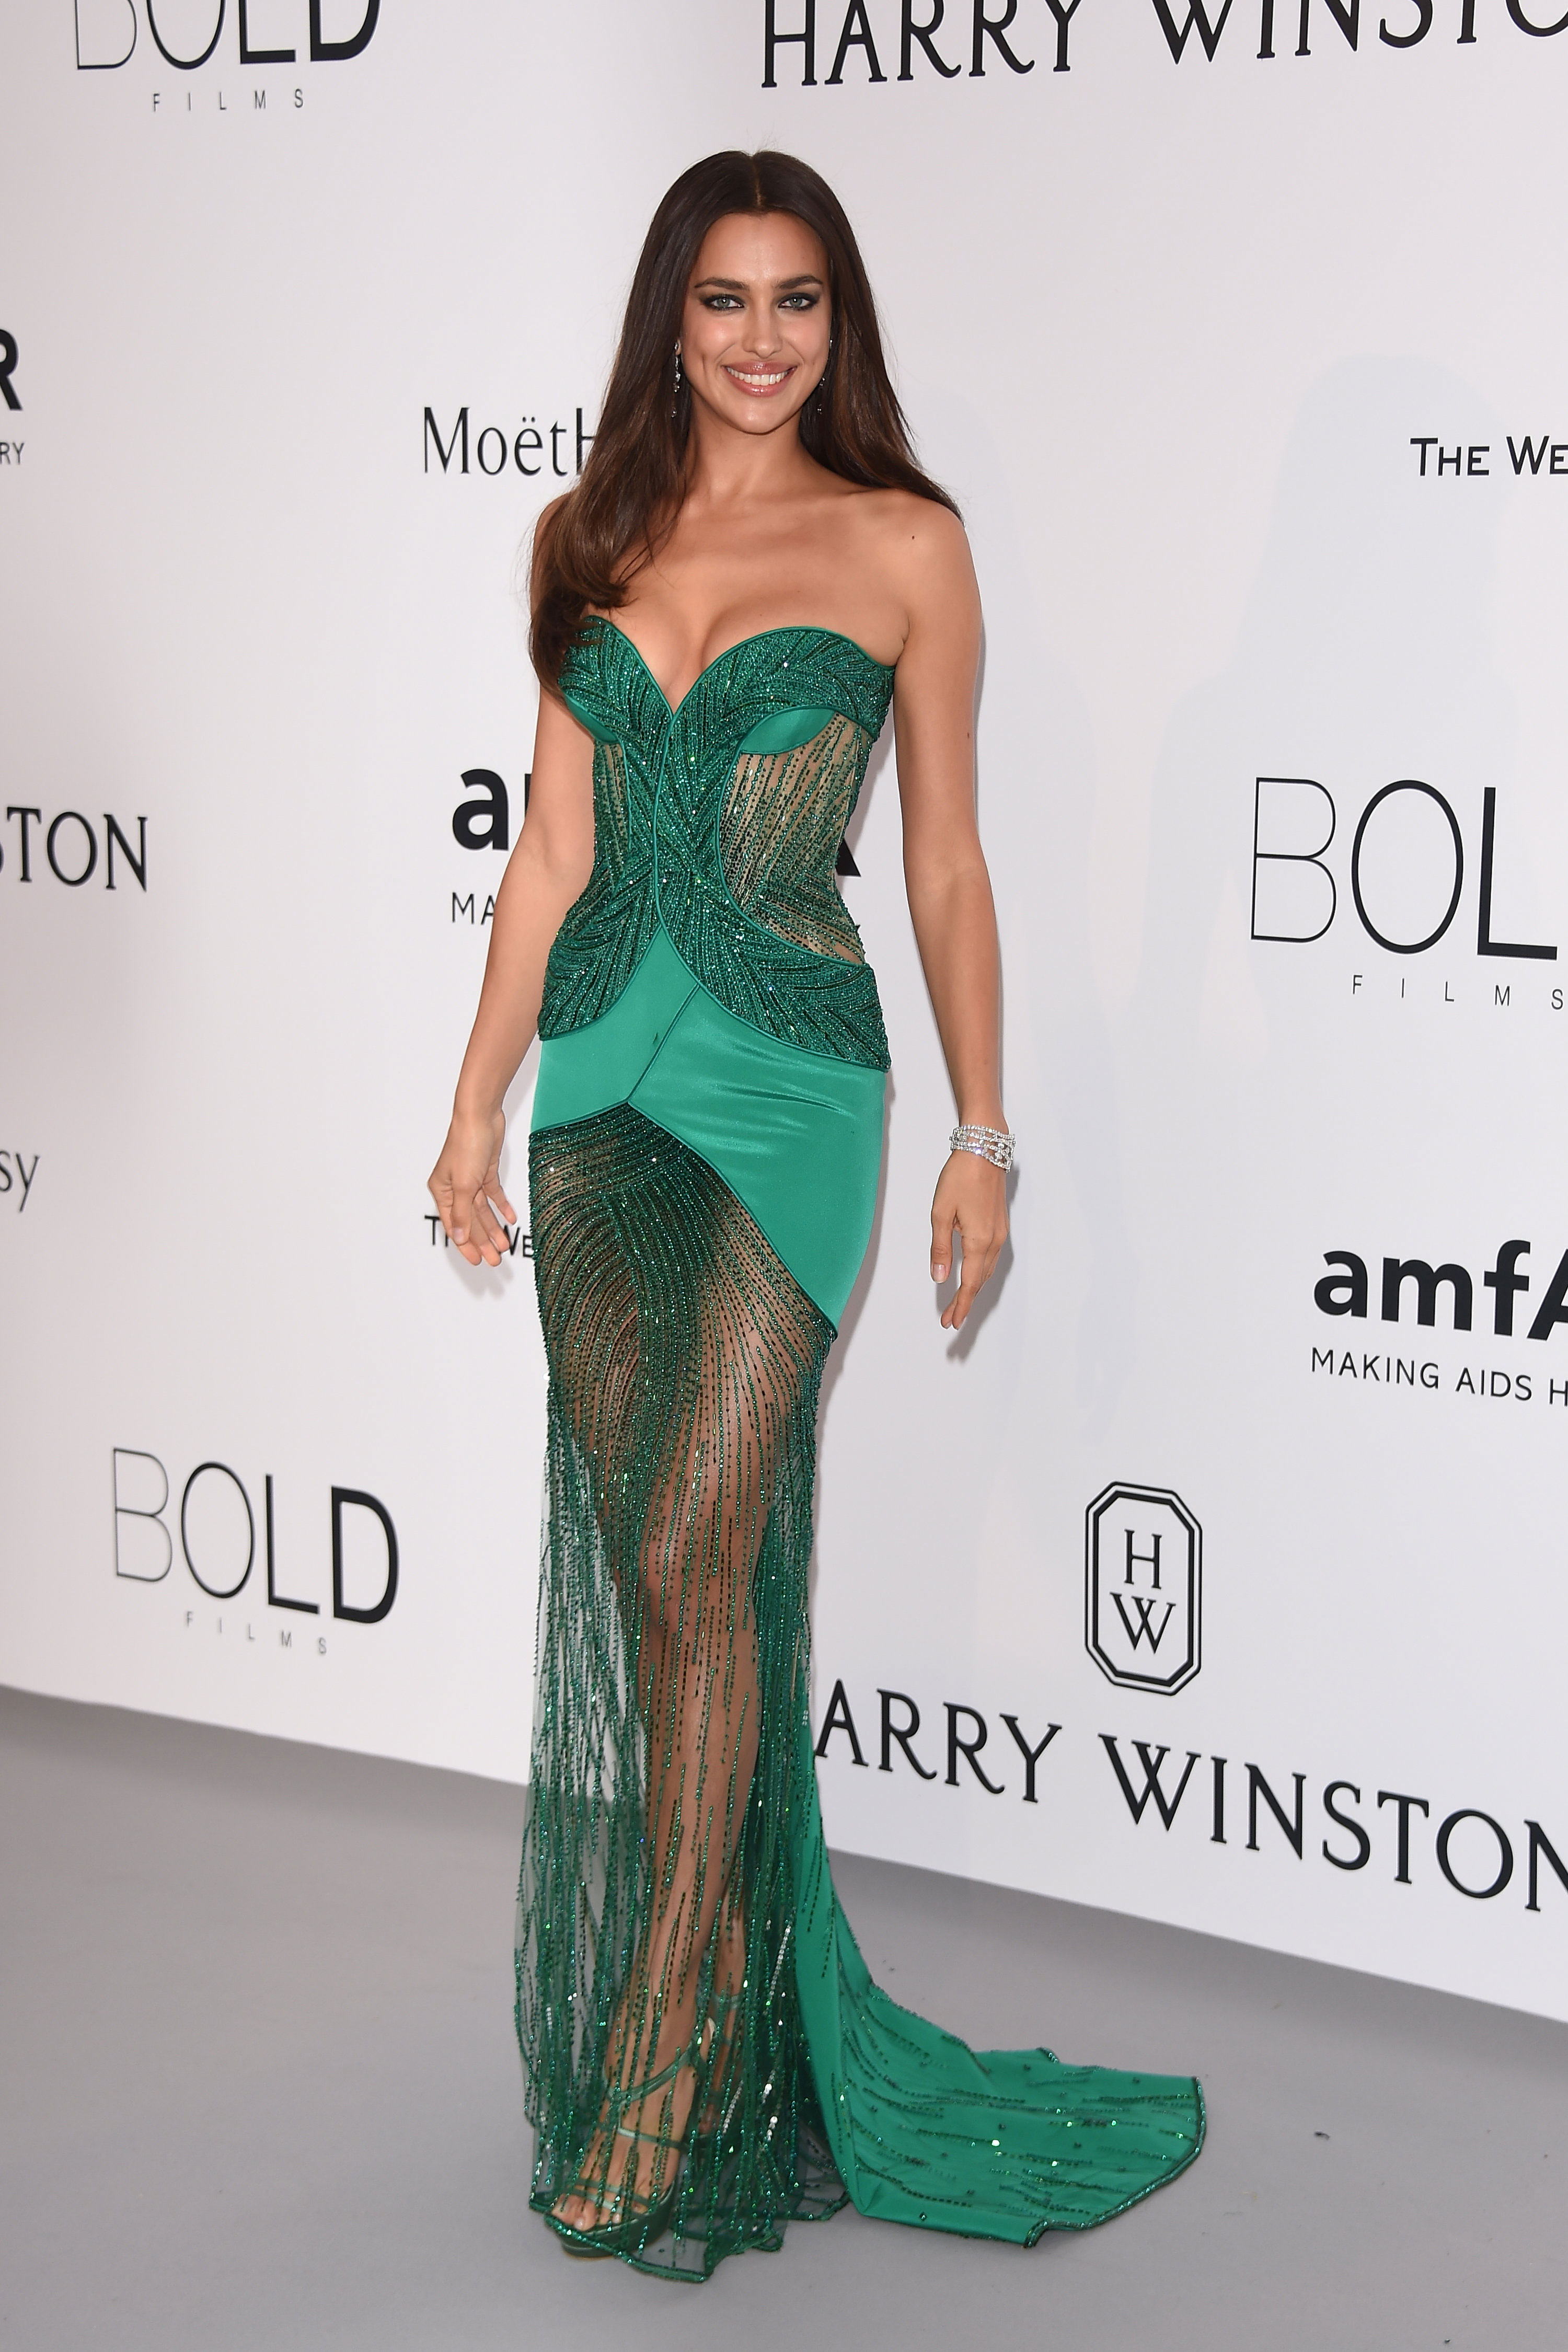 Irina Shayk attends amfAR's 22nd Cinema Against AIDS Gala at the Cannes Film Festival.